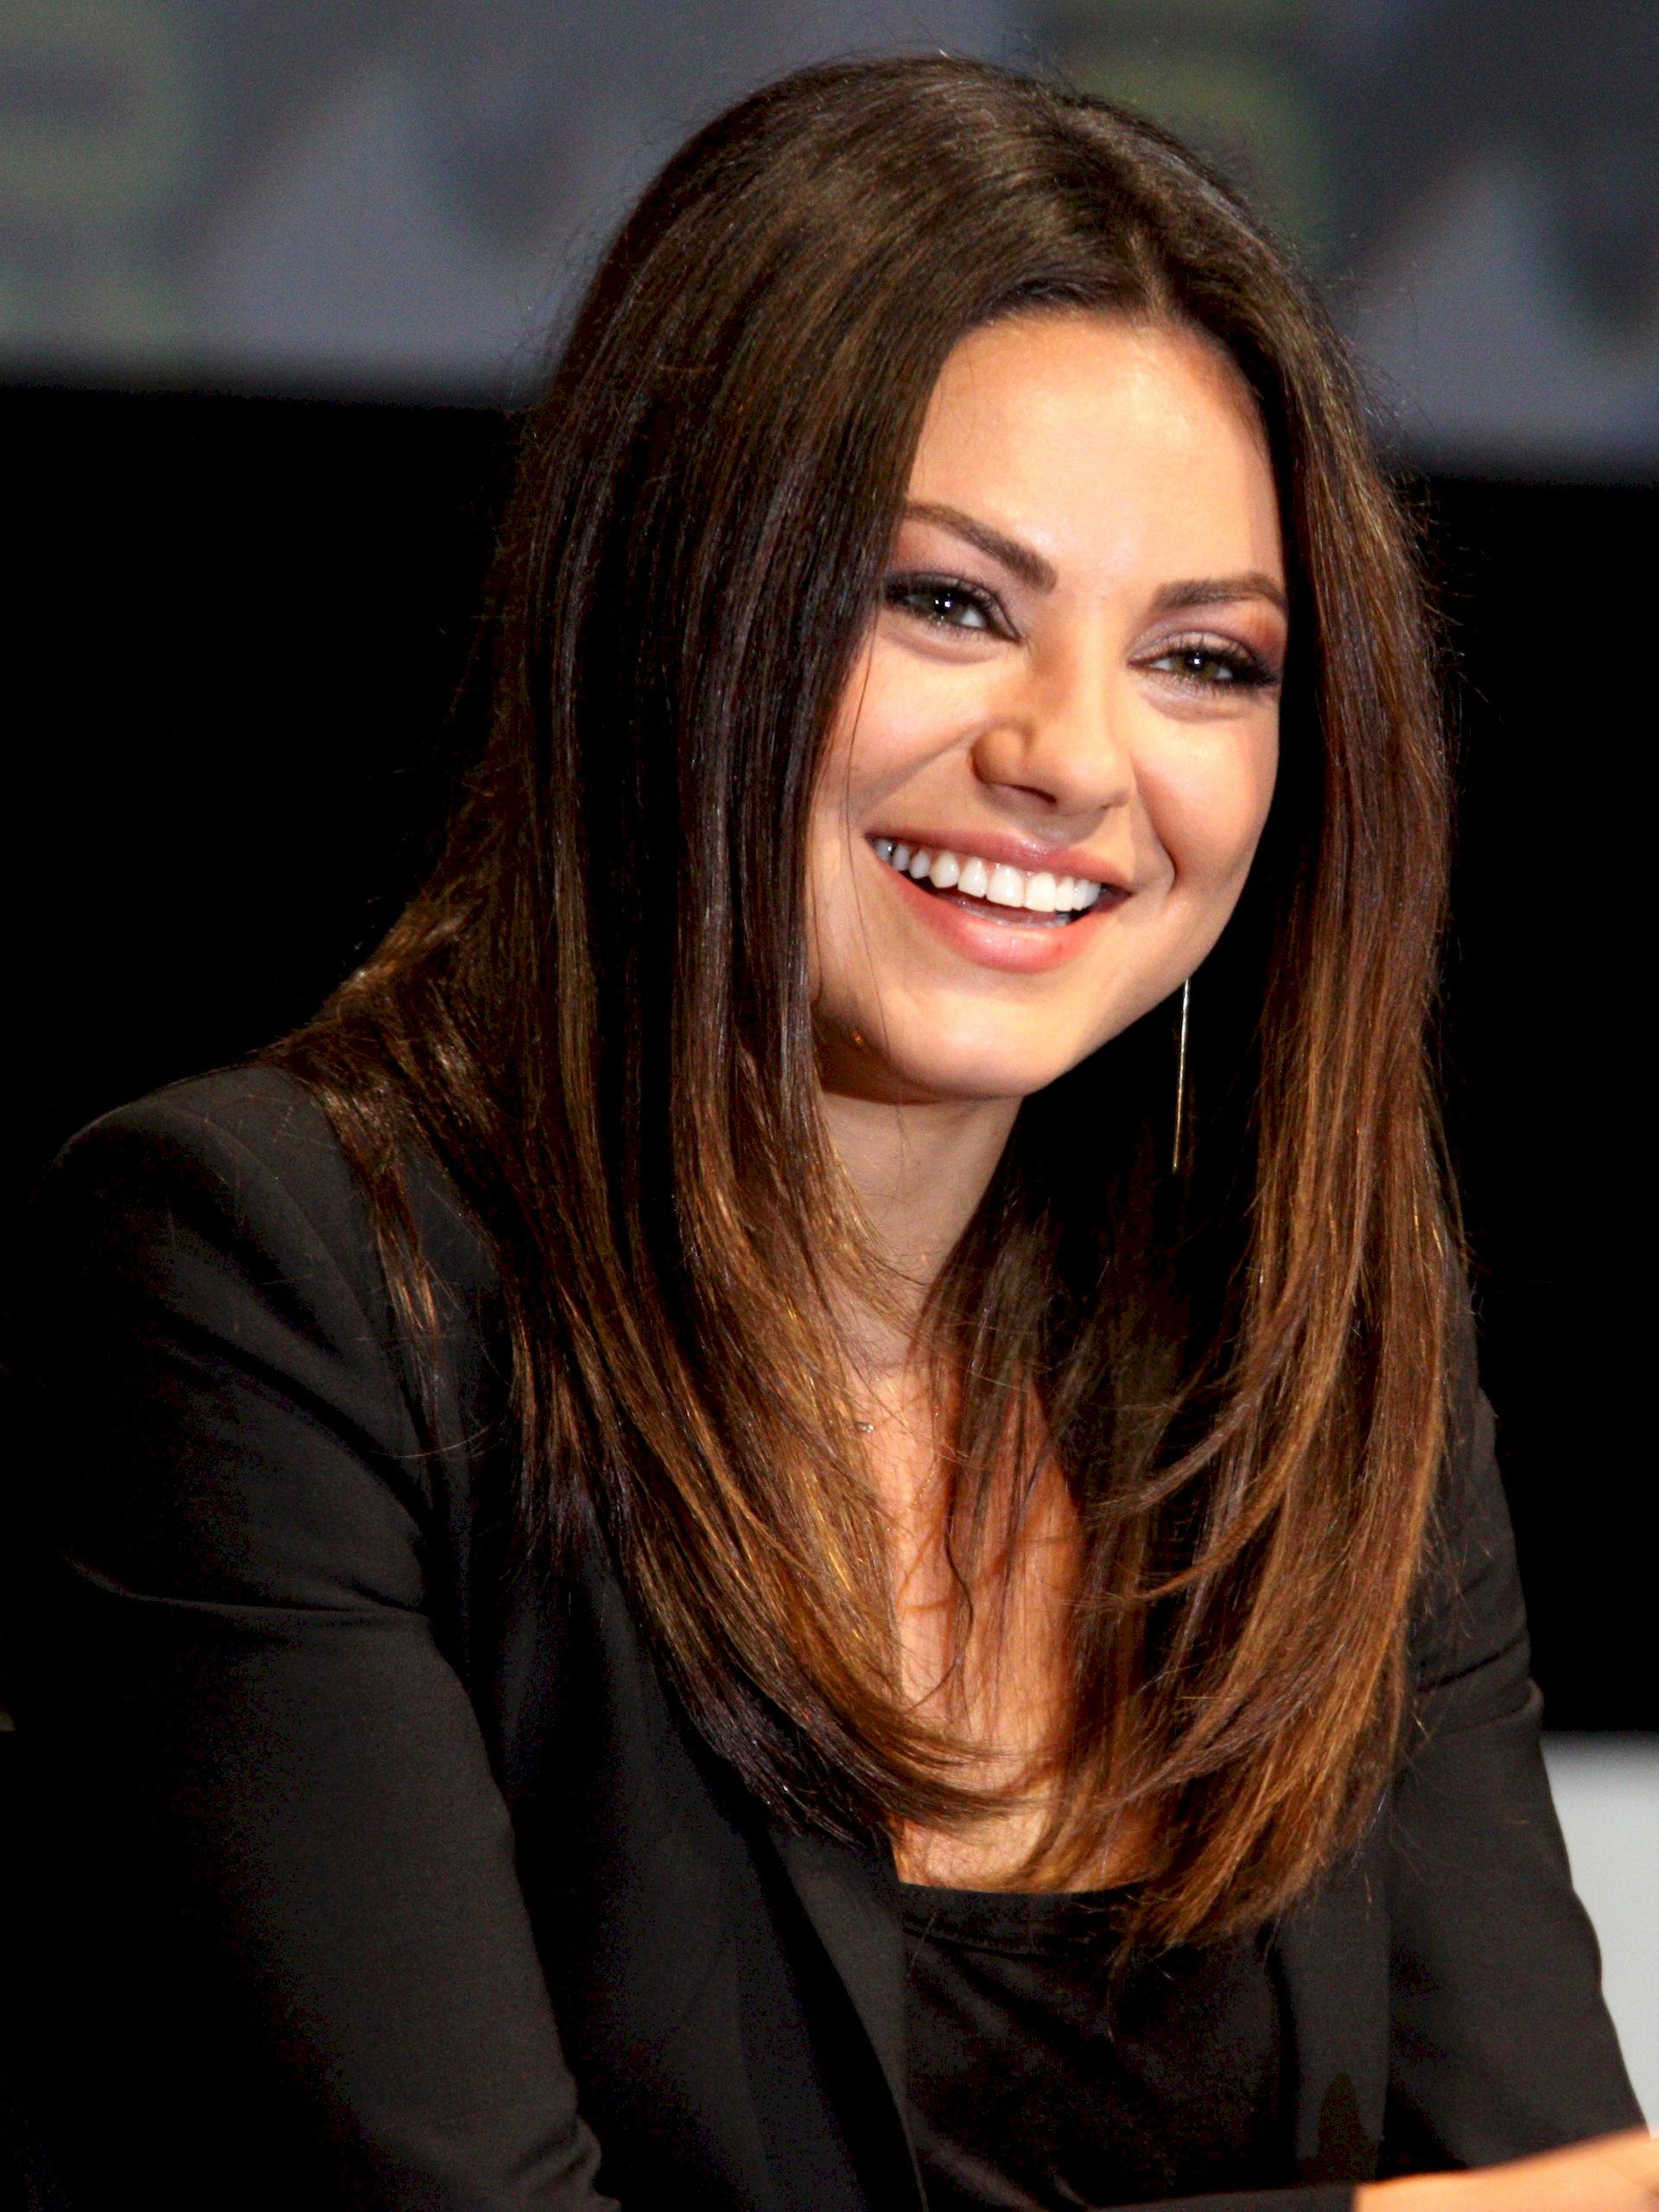 Photo of Mila Kunis: American actress